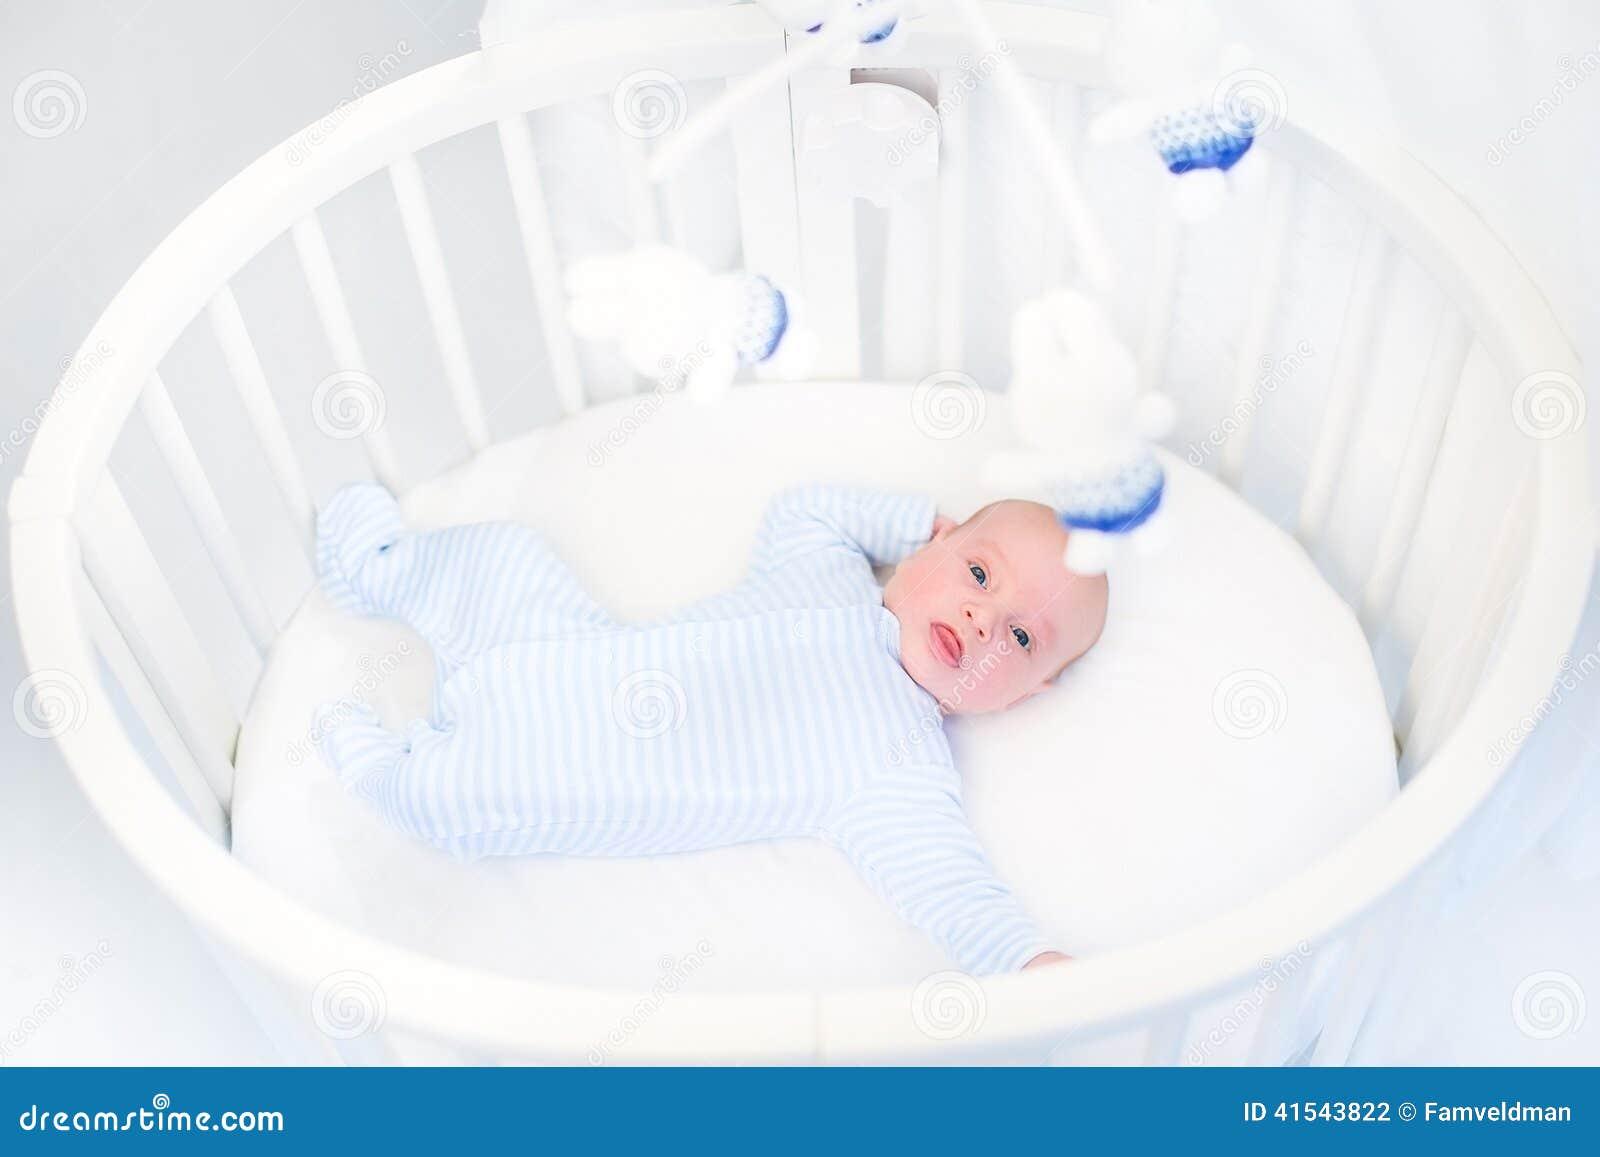 Cute Newborn Baby Boy In A White Round Crib Stock Photo - Image ...